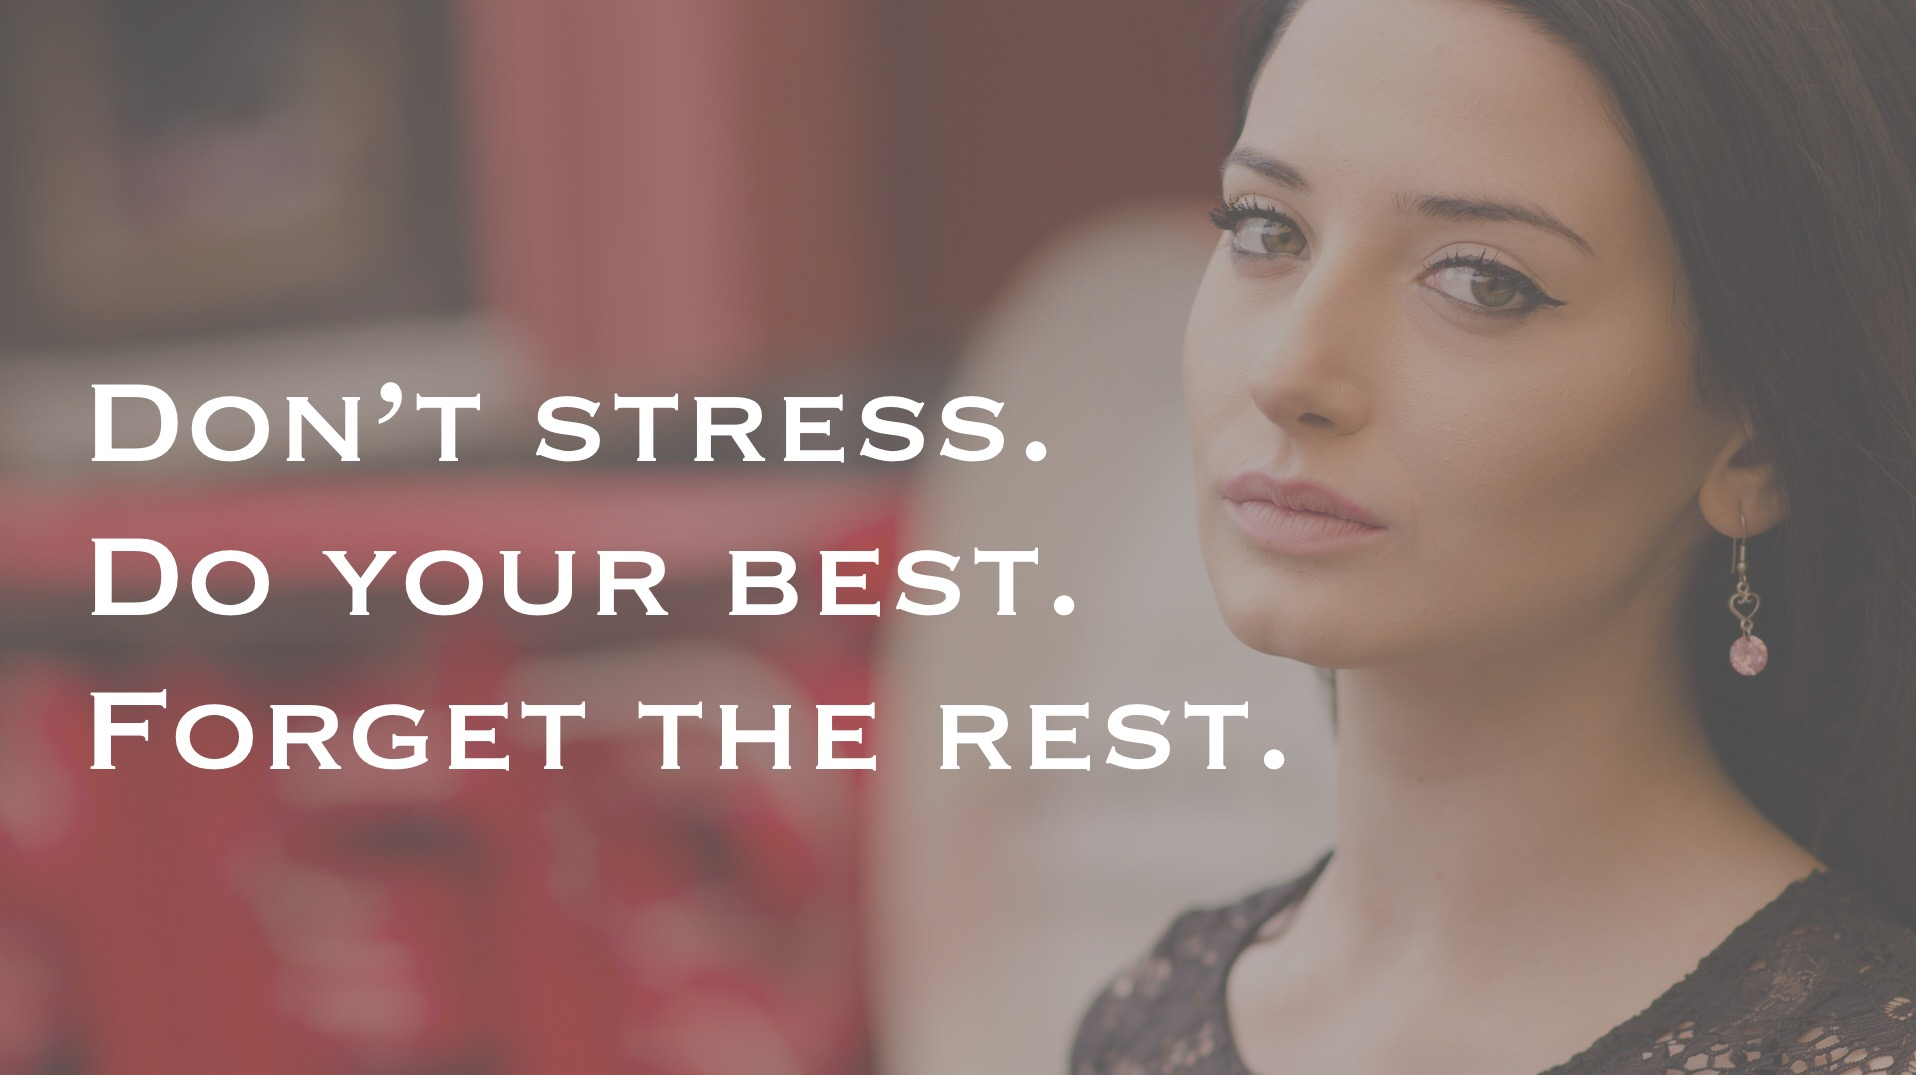 Get rid of stress